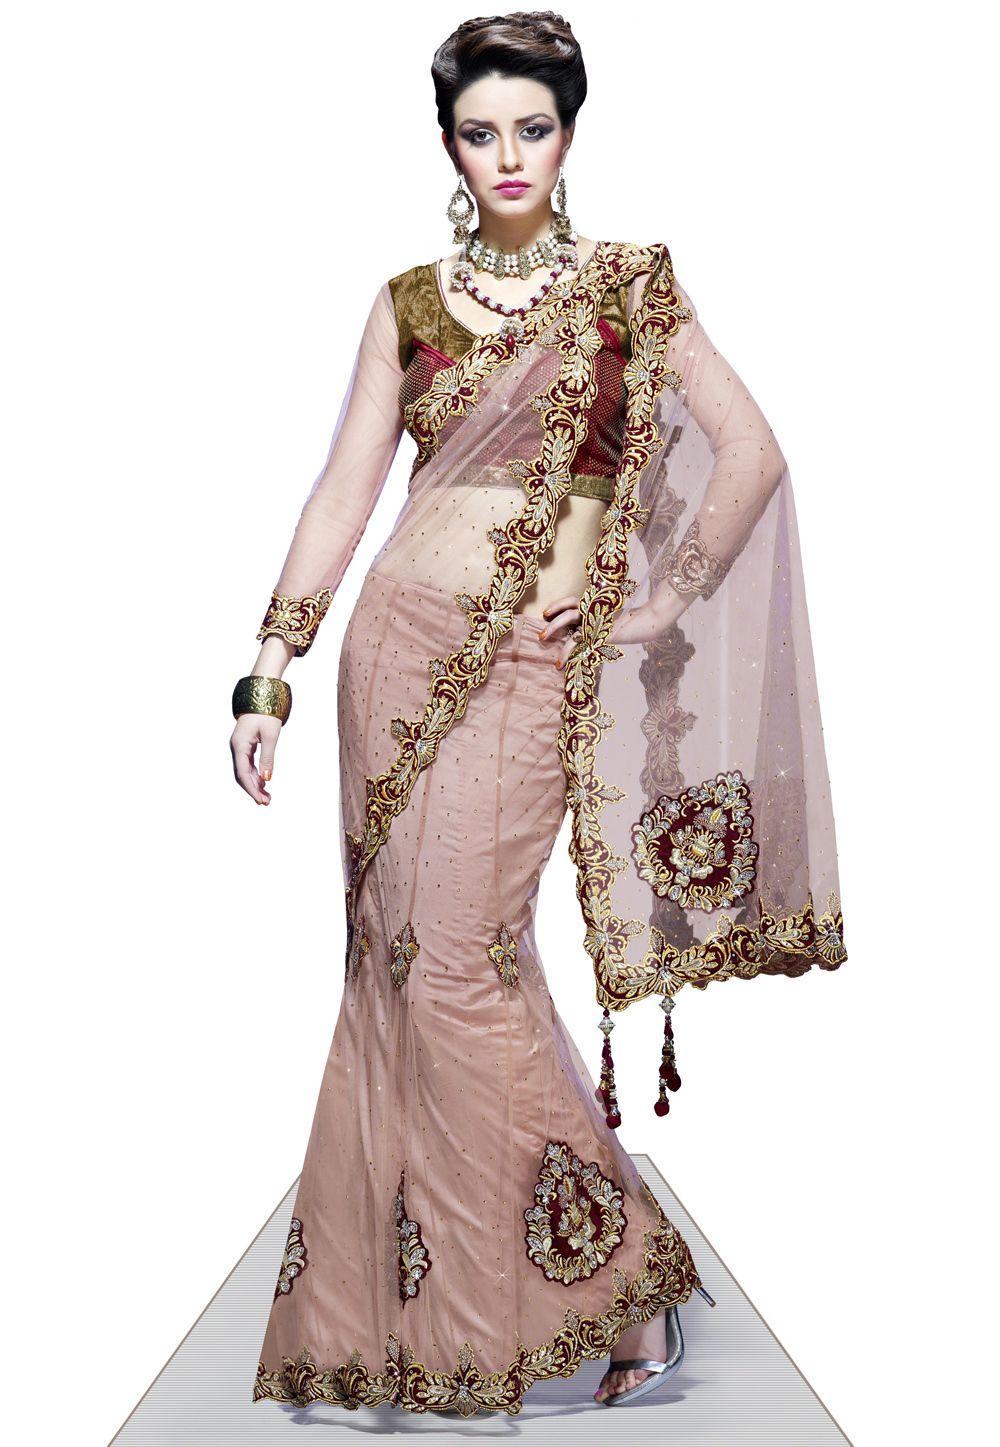 Peach Net Lehenga Style Saree With Blouse 155 30 Lehenga Style Saree Party Wear Sarees Lehenga Saree